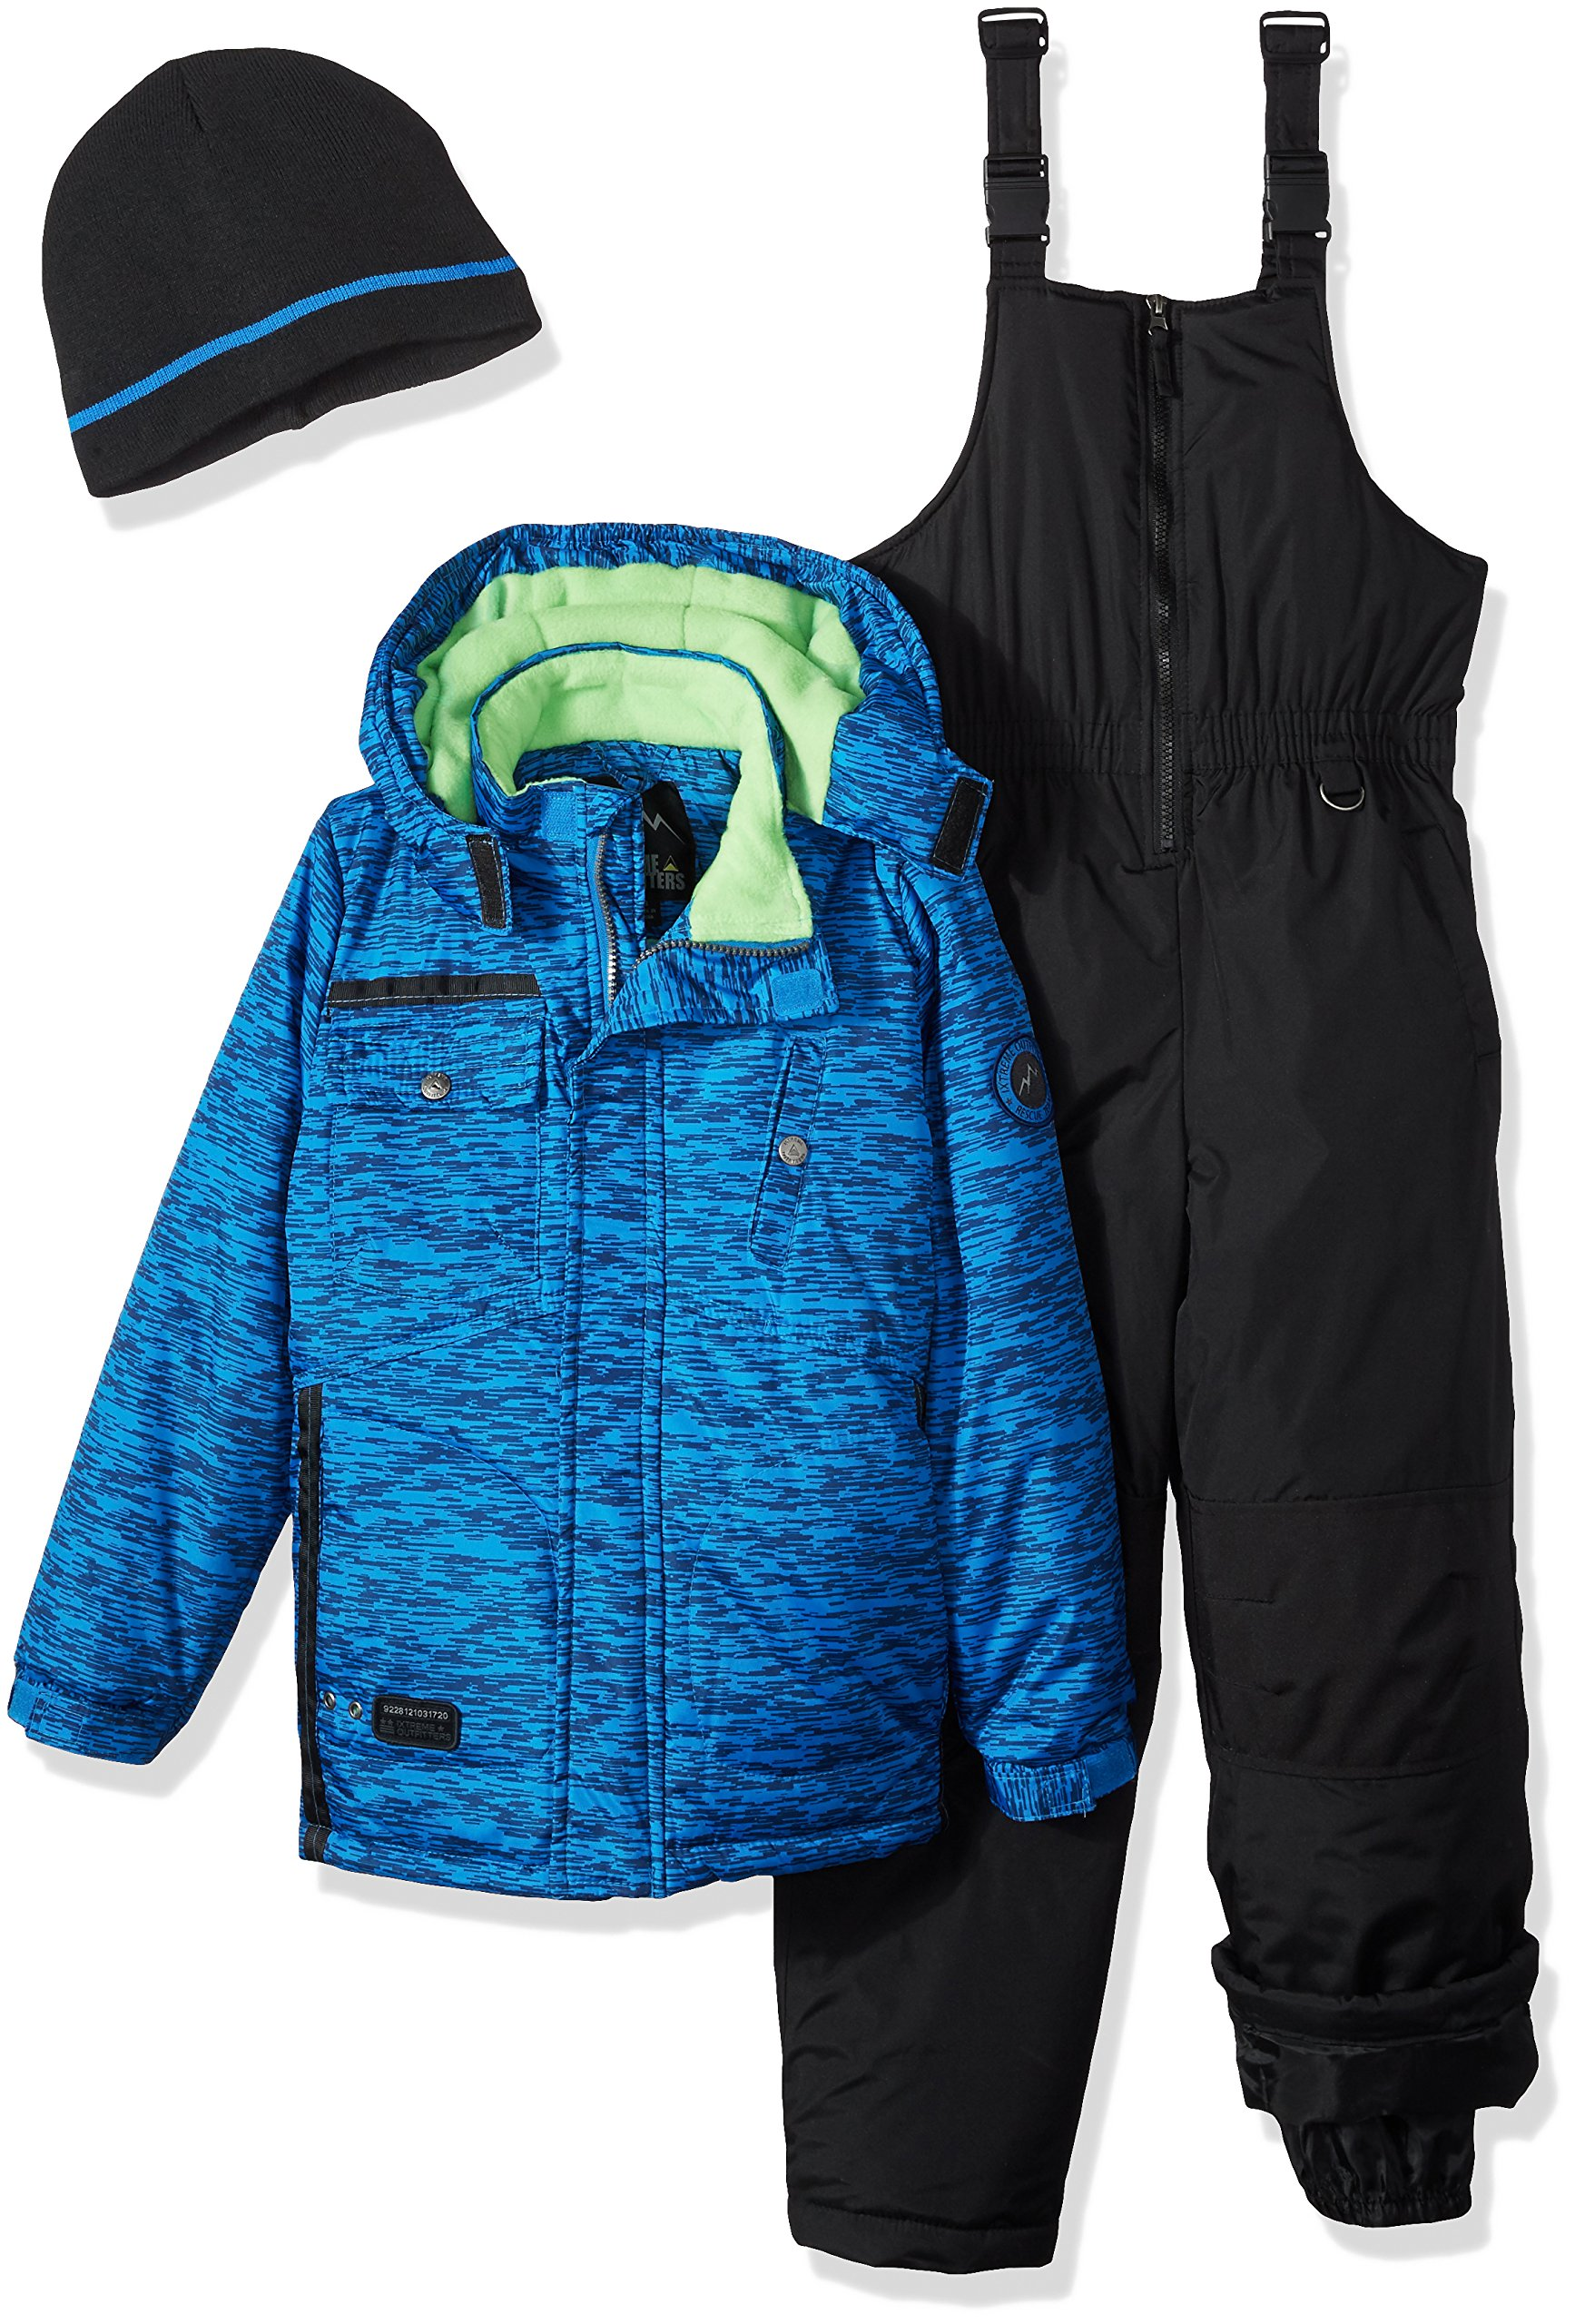 iXtreme Boys' Big Tonal Print Snowsuit W/Gaiter, Blue, 14/16